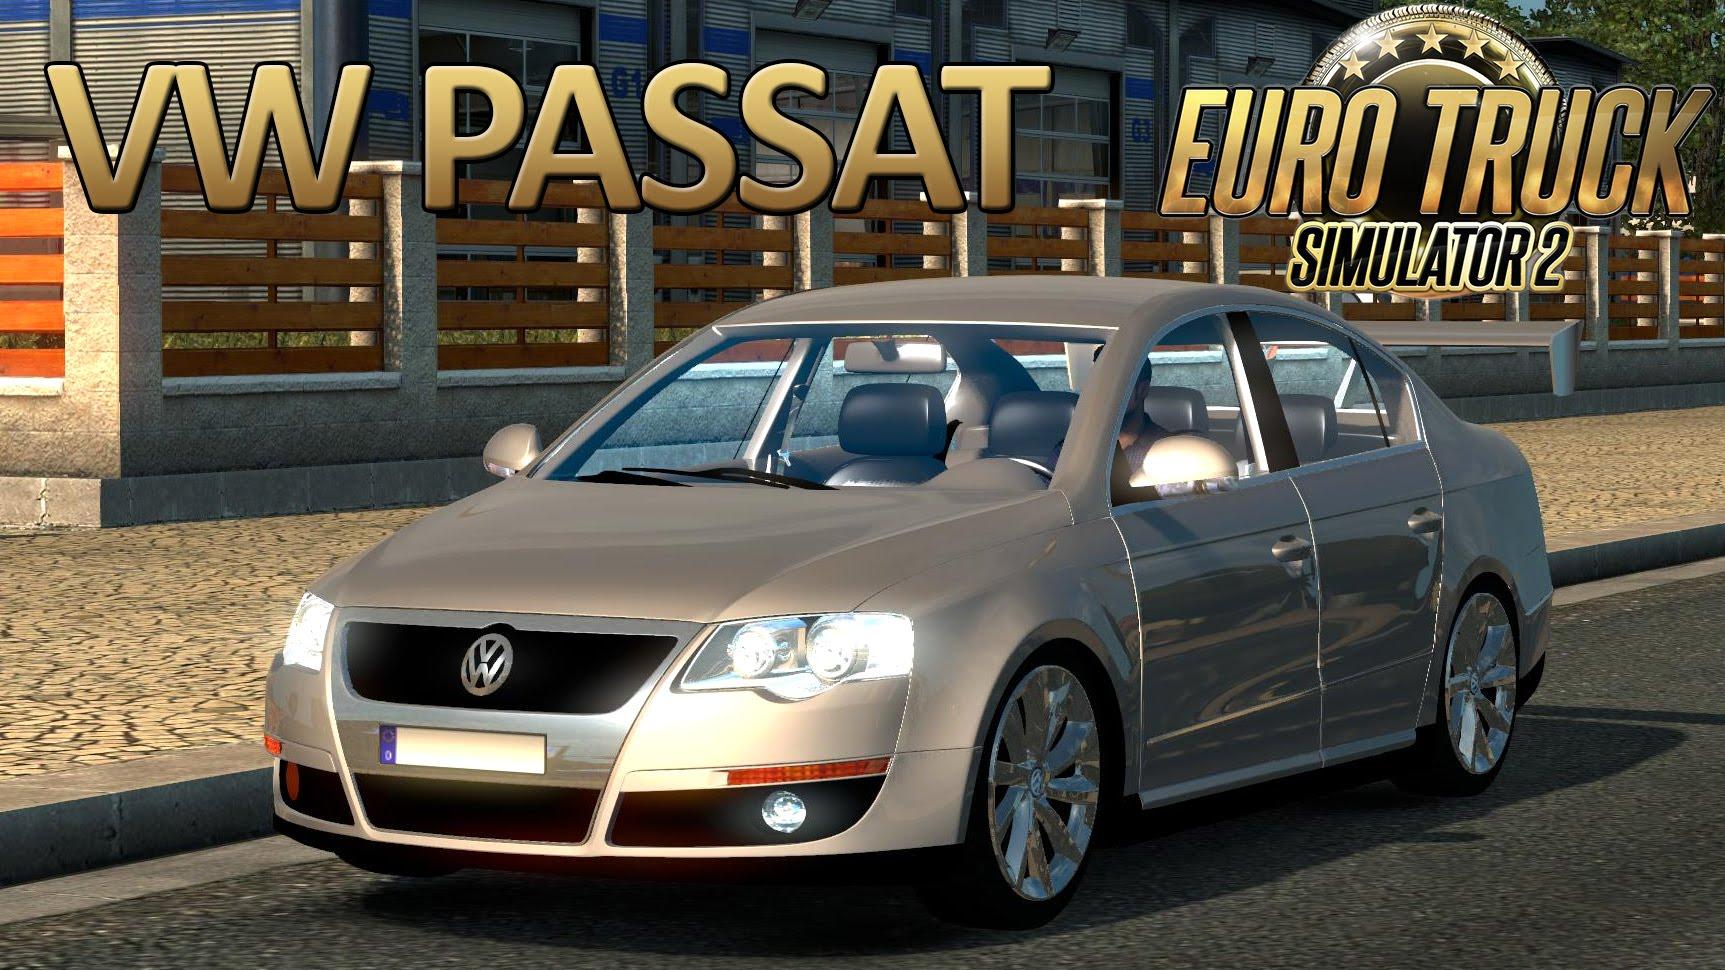 Volkswagen Passat B6 + Interior v1 2 (1 25 x) » ETS2 mods